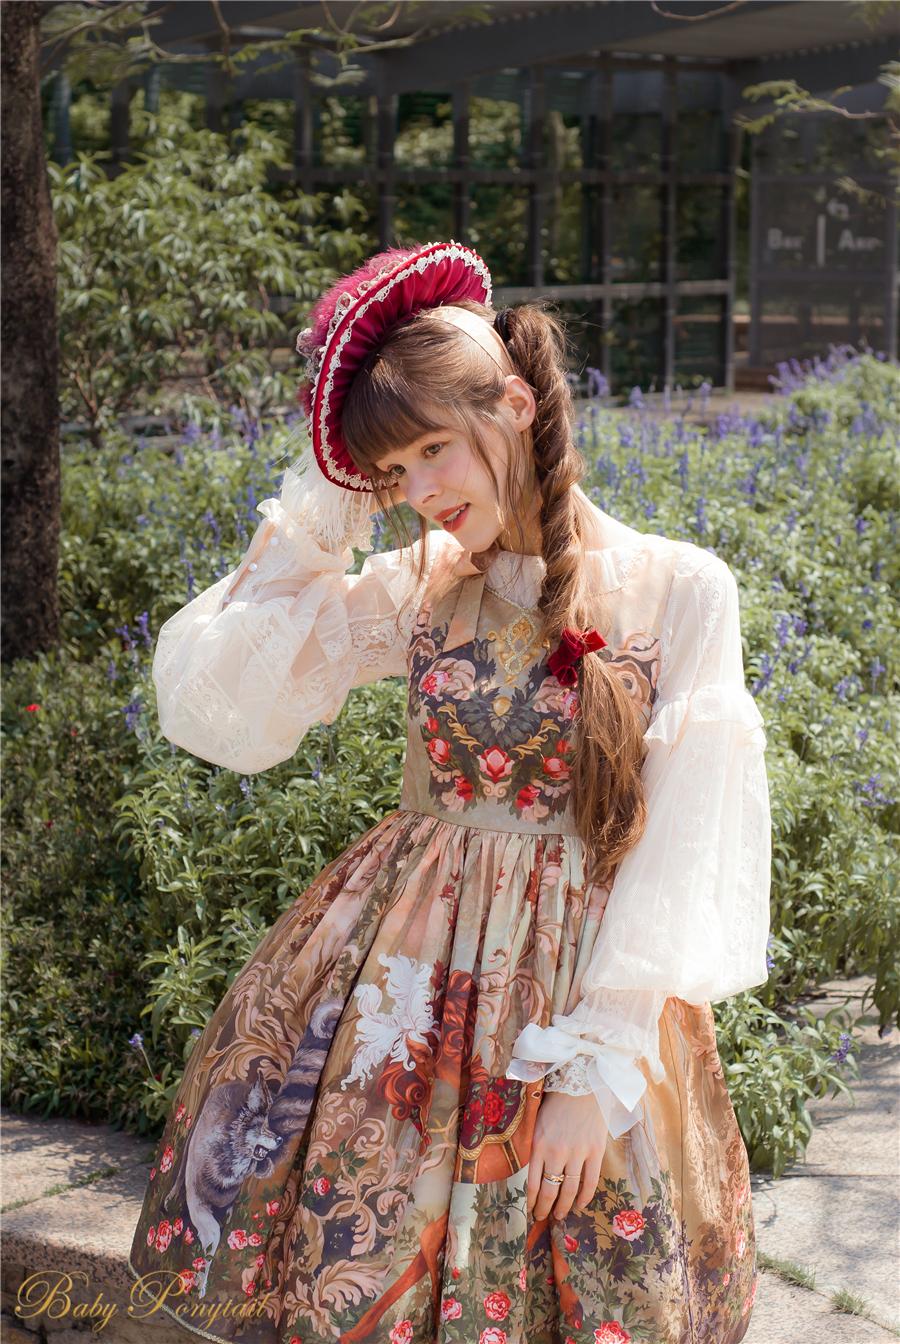 Babyponytail_Rose Battle_Preview_JSK Model Photo_Claudia_14.jpg